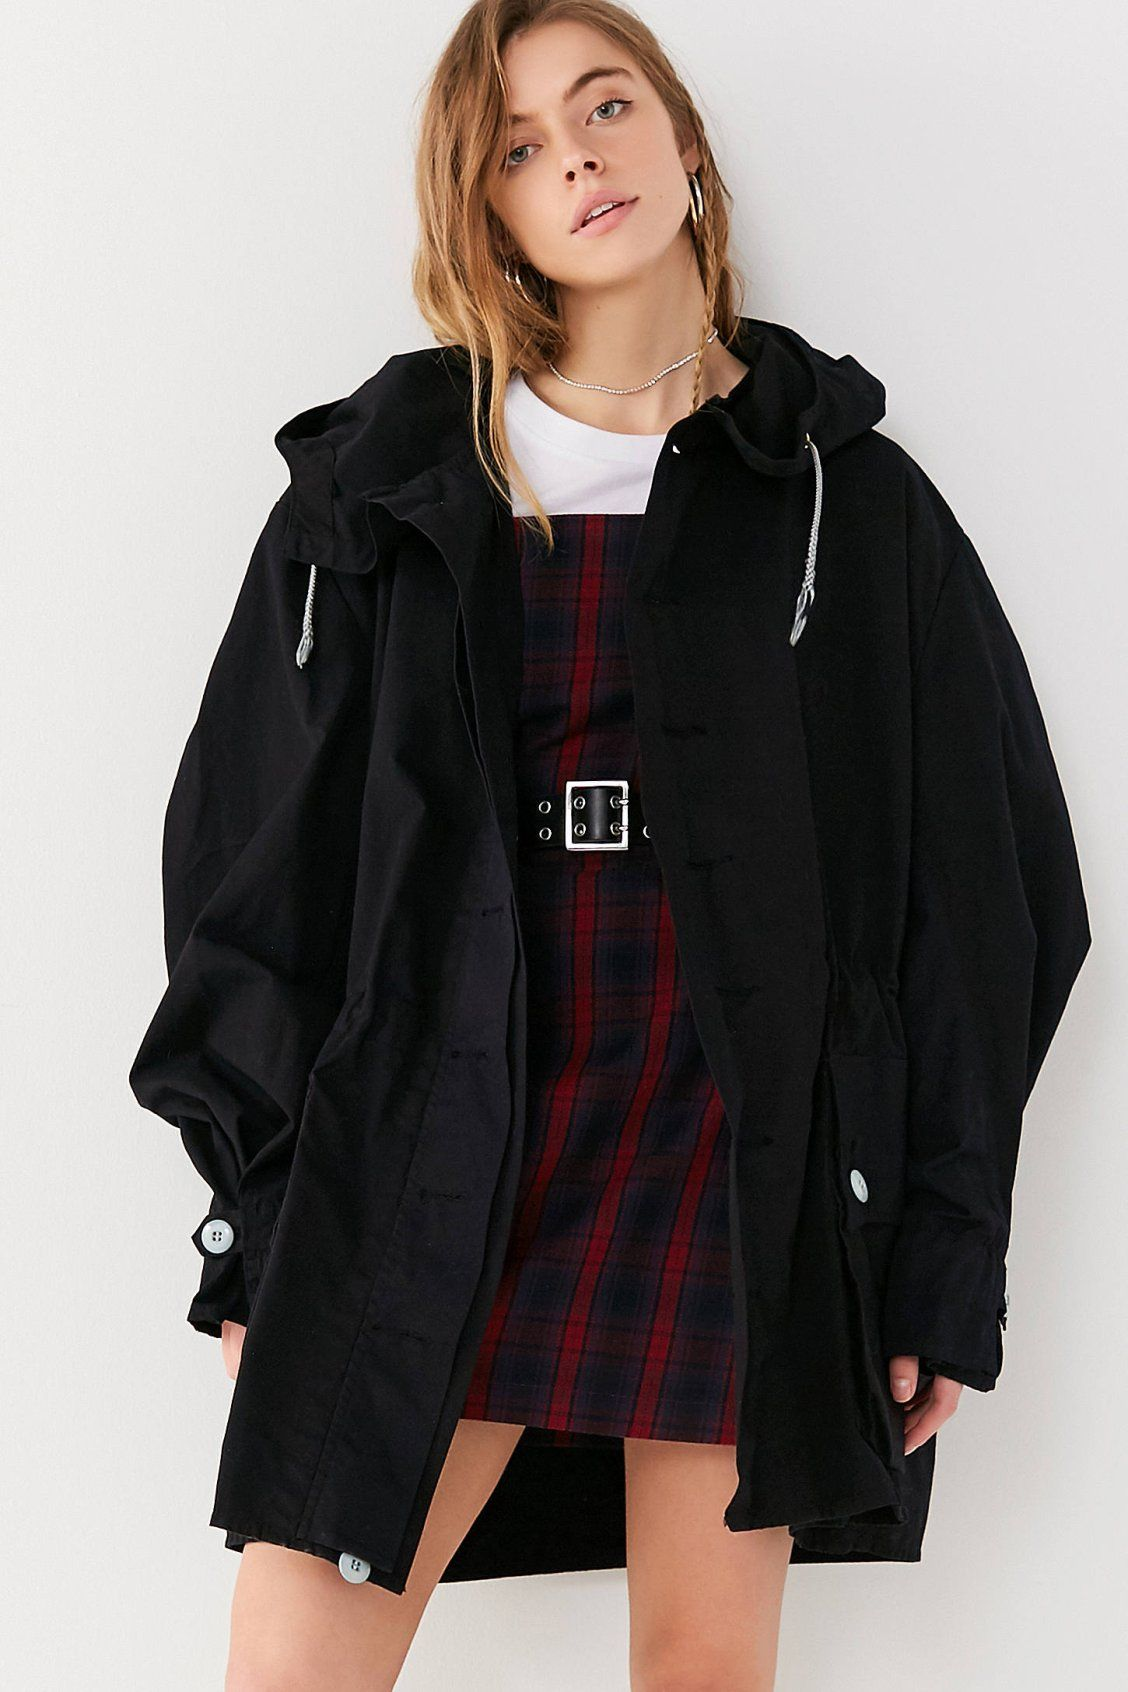 037334d4546a8 Vintage Oversized Snow Parka Coat